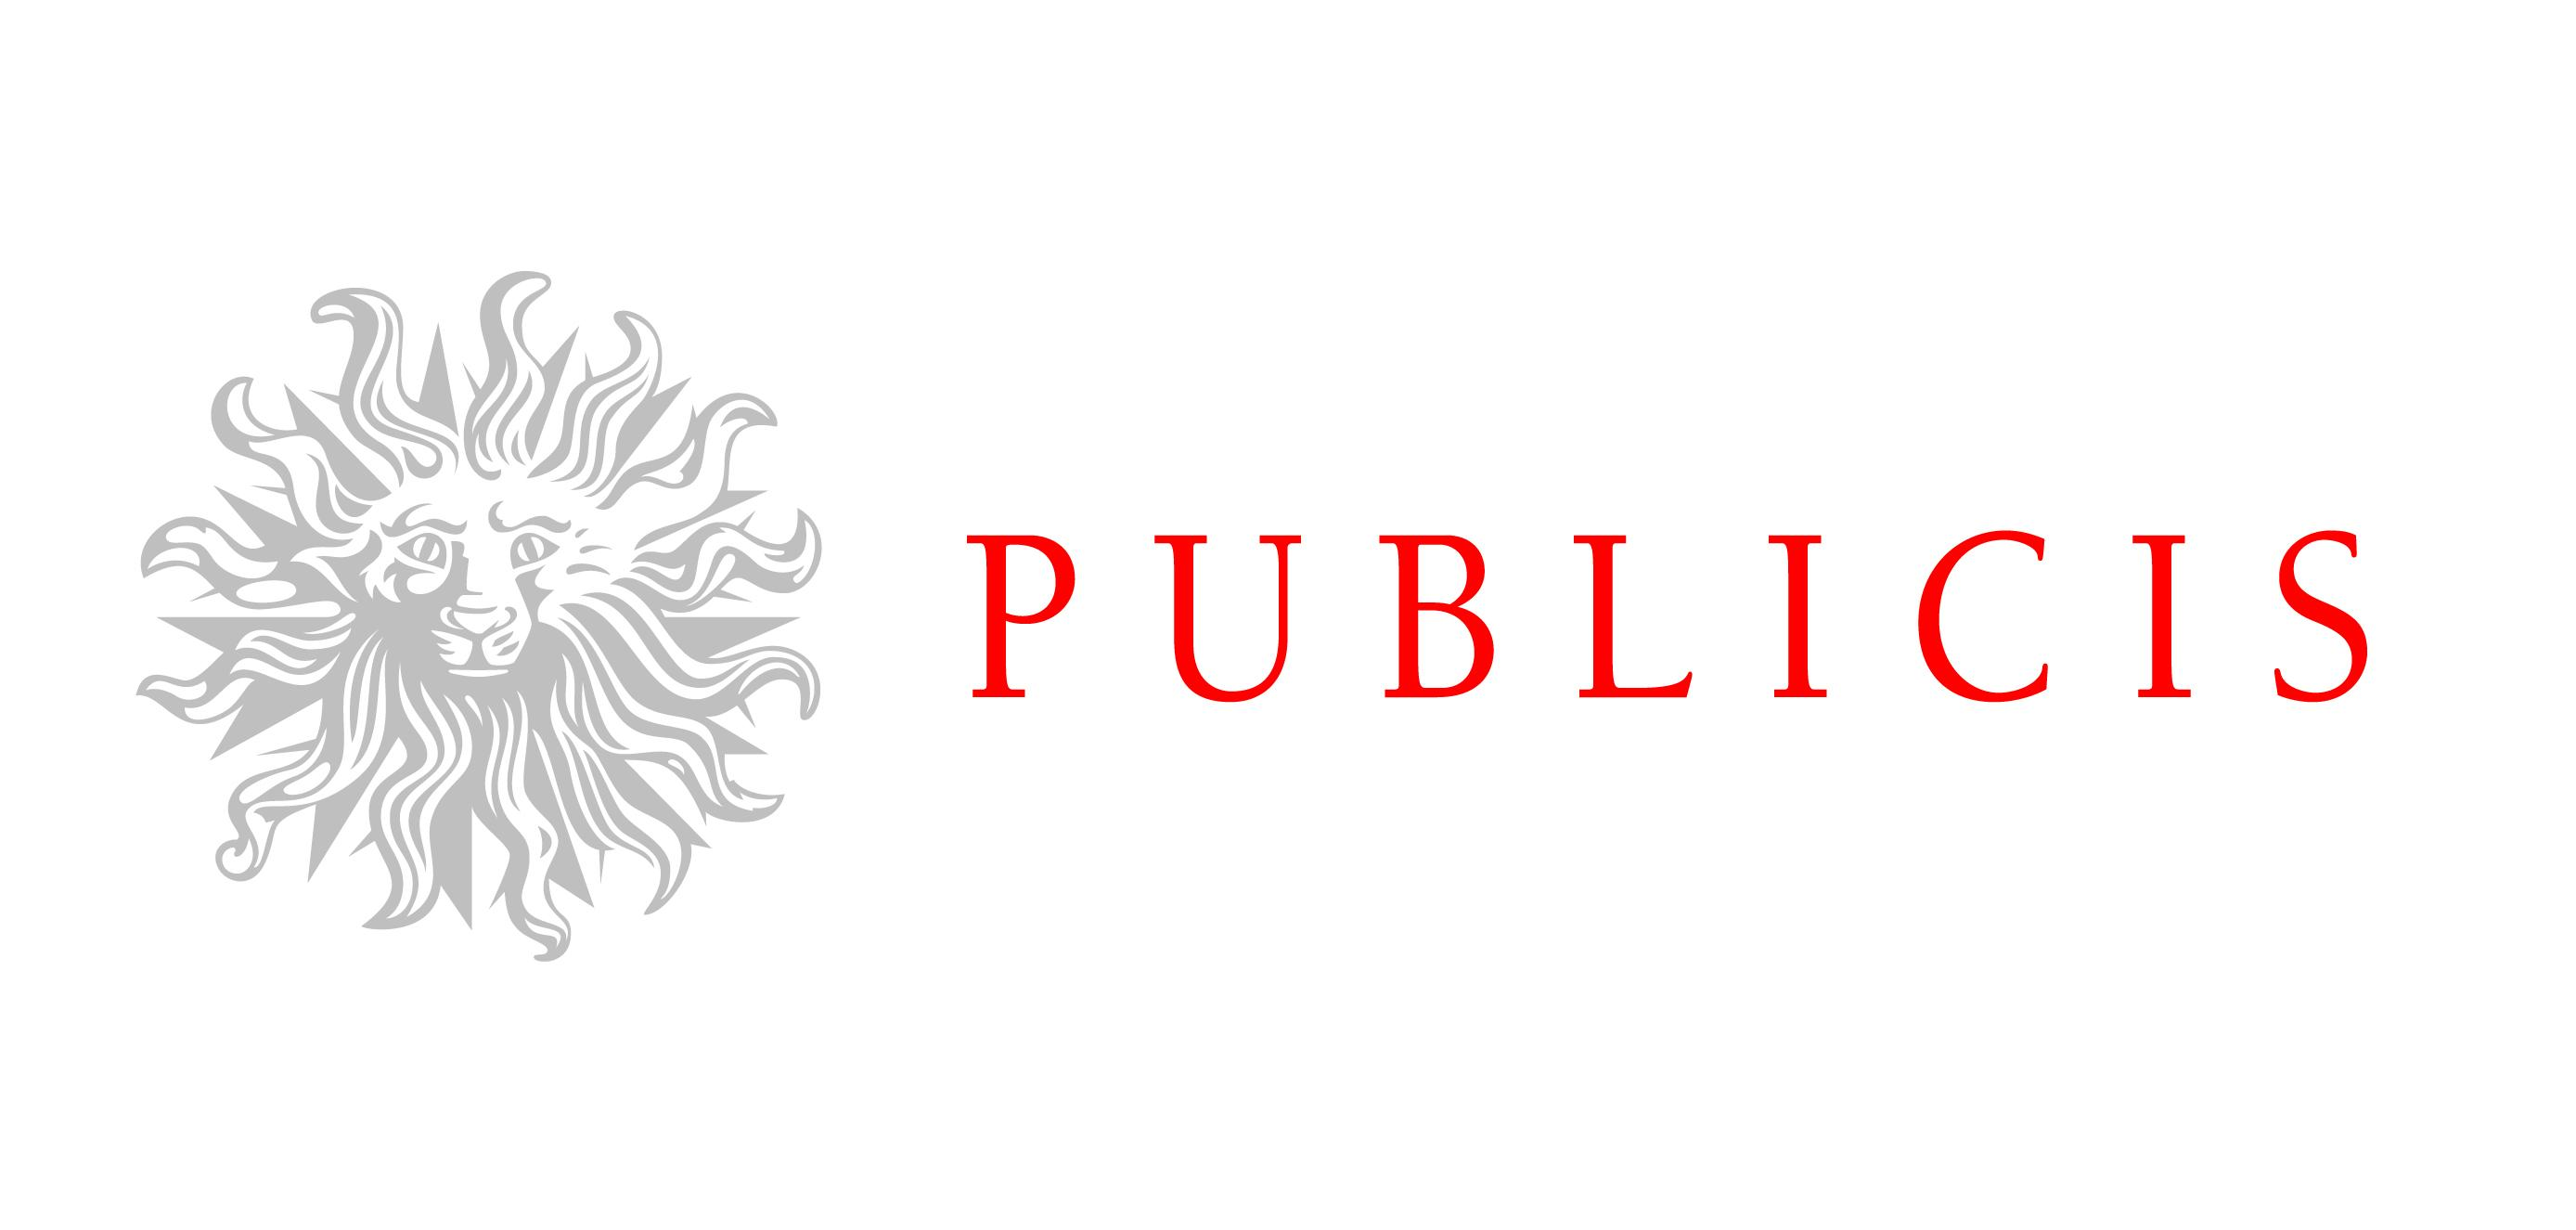 dans-ta-pub-publicis-worldwide-new-logo-identity-3